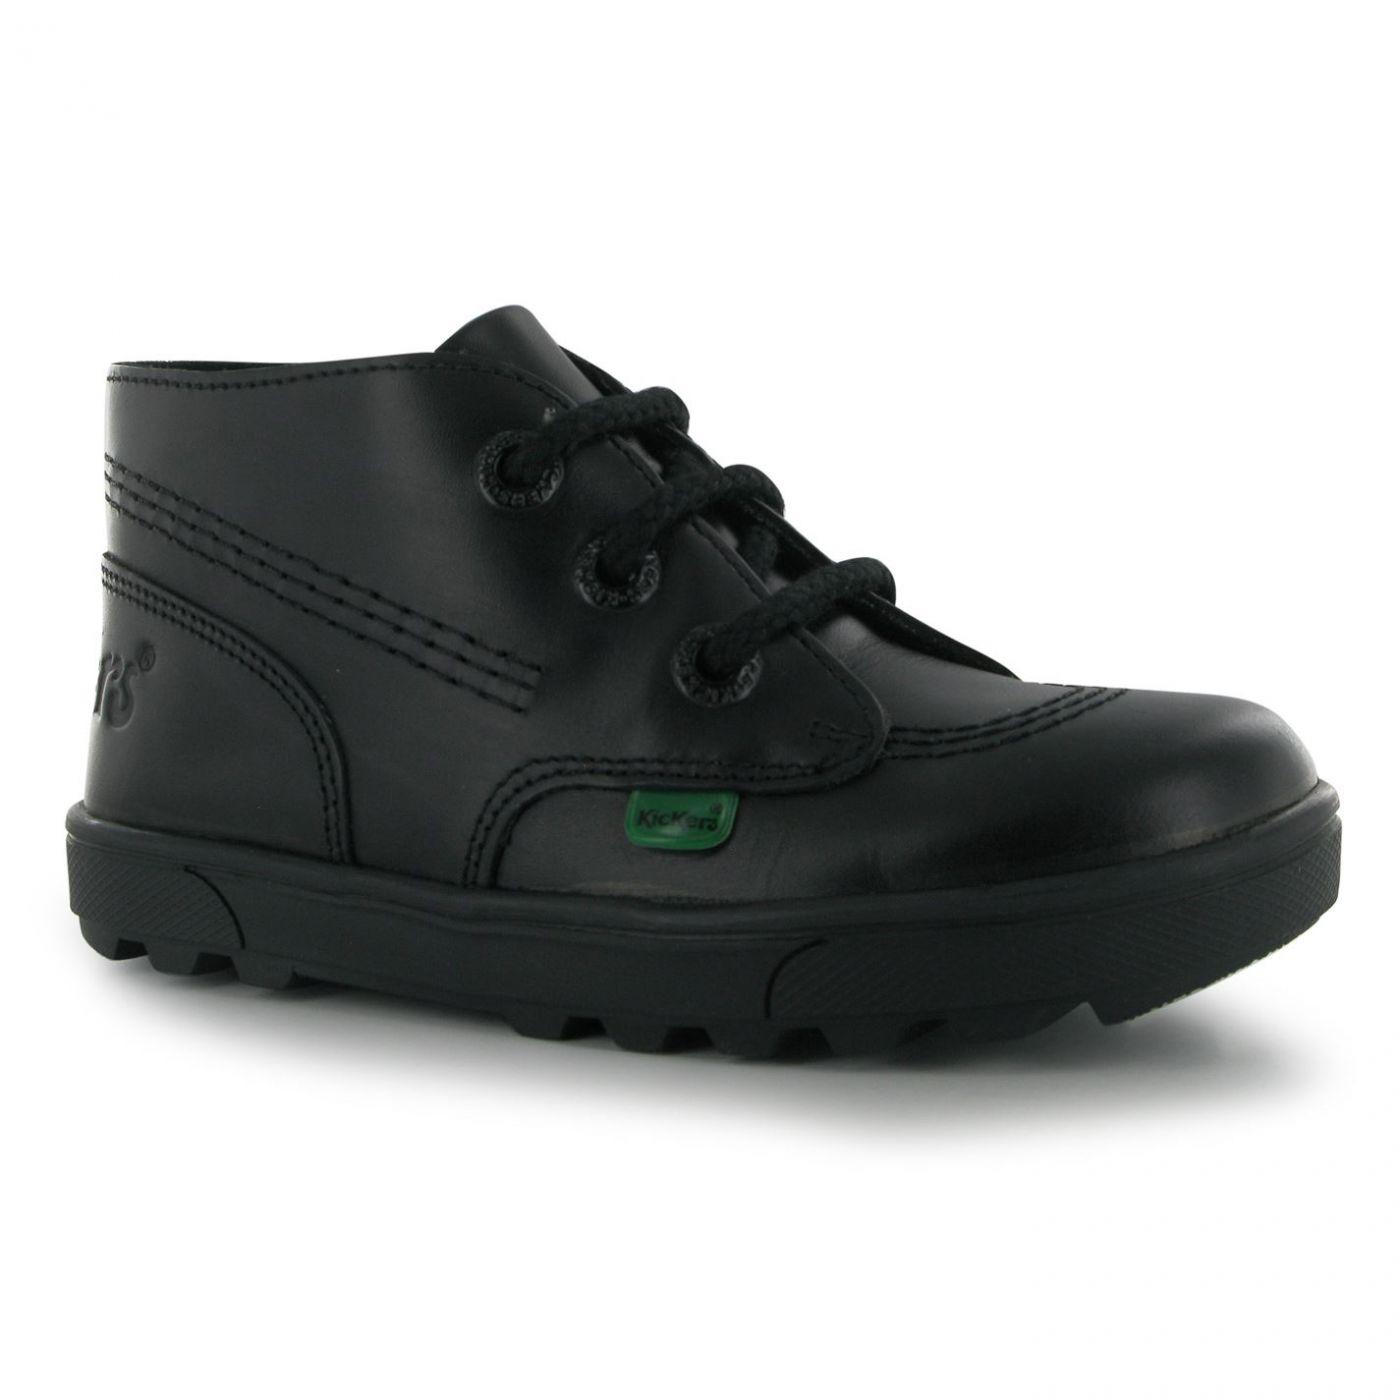 Kickers Disley Hi Childrens Shoes